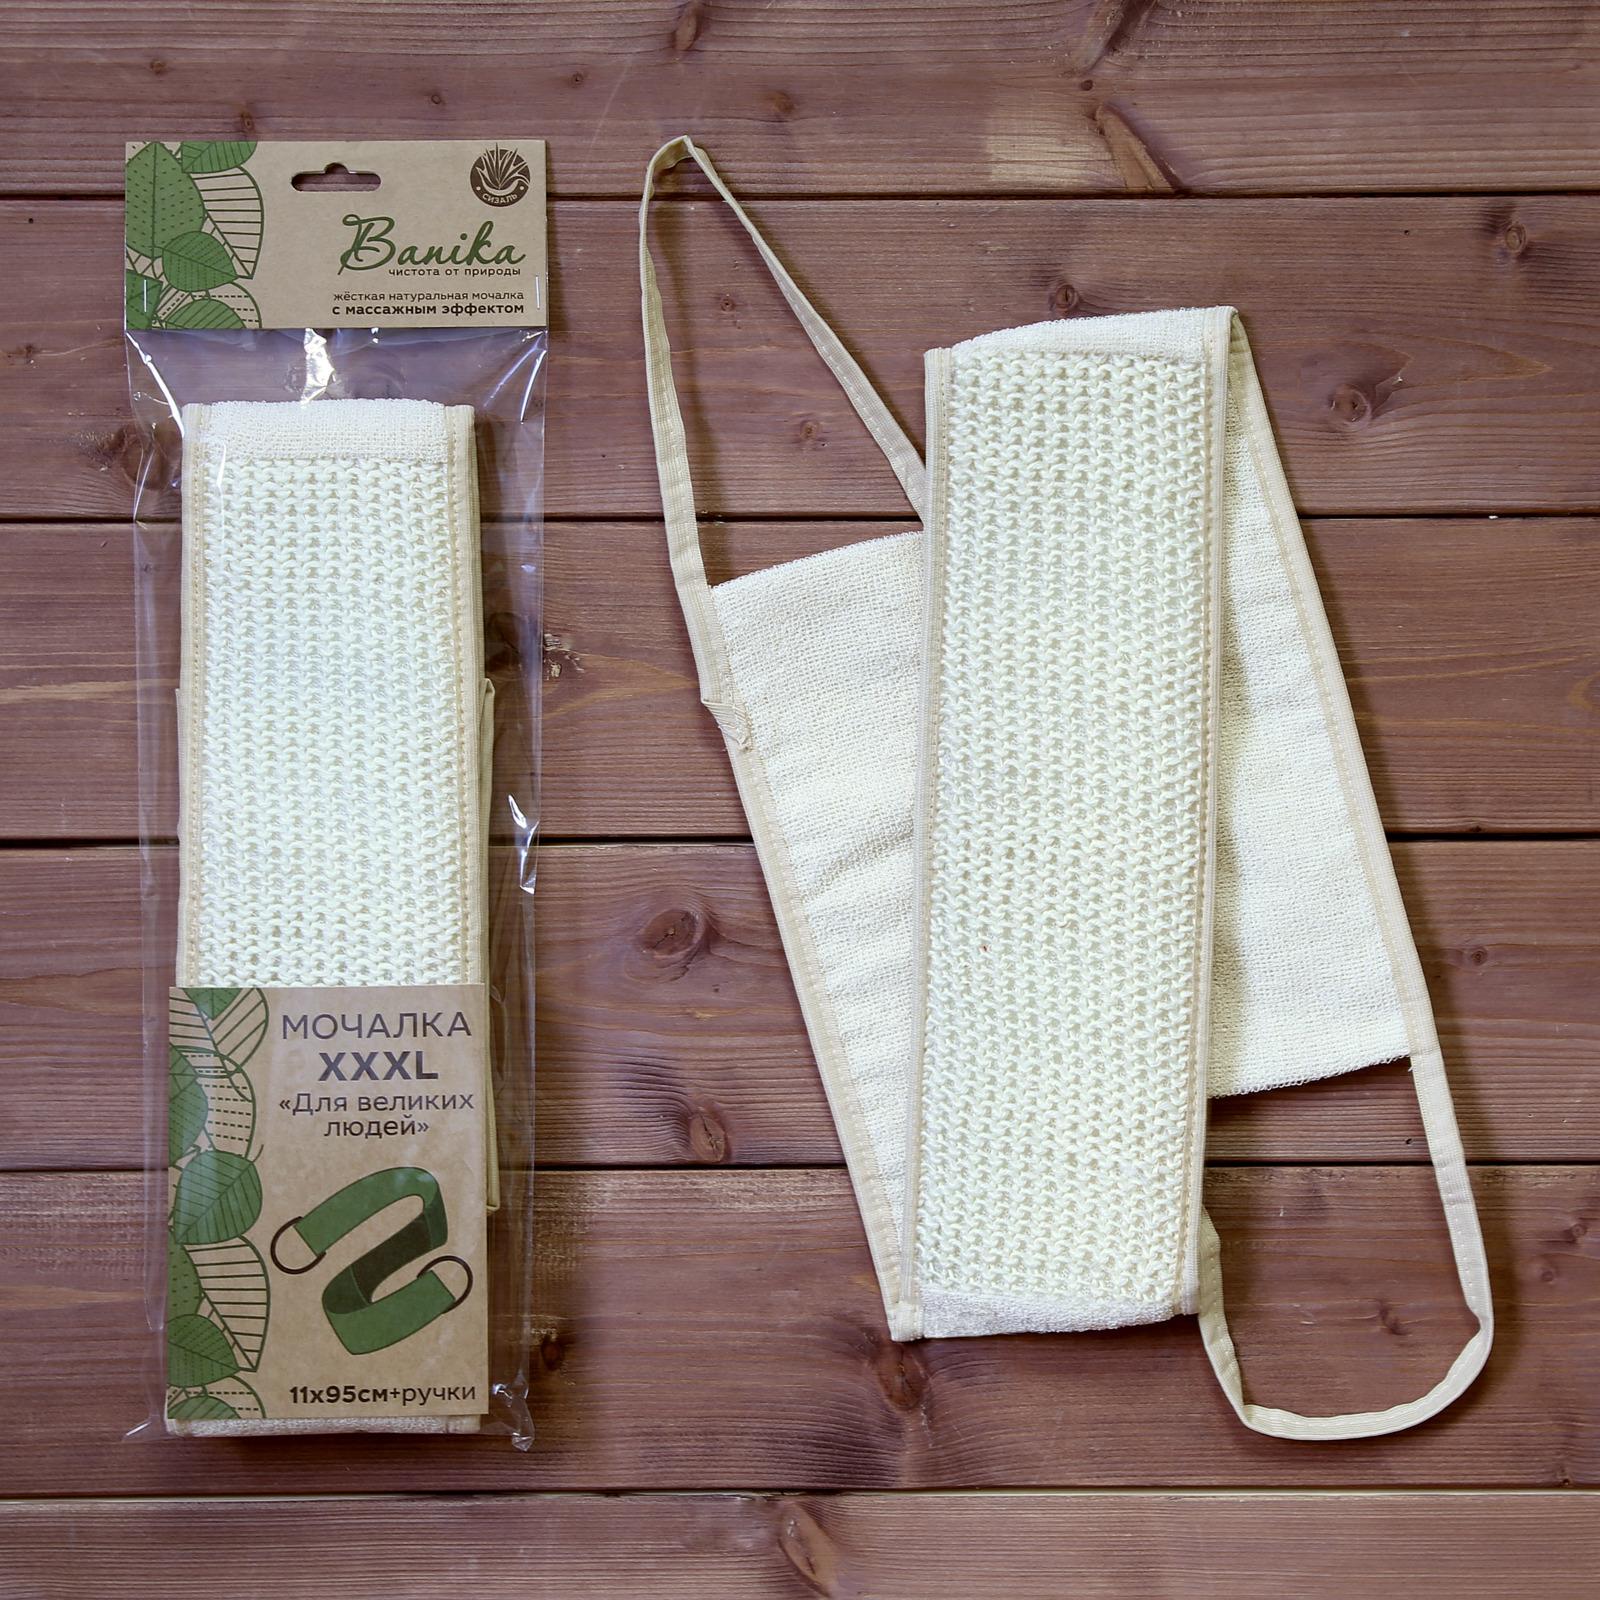 Мочалка Banika XXXL Сизаль, 95 х 11 см мочалка для тела жесткая зеленая cure nylon towel regular green